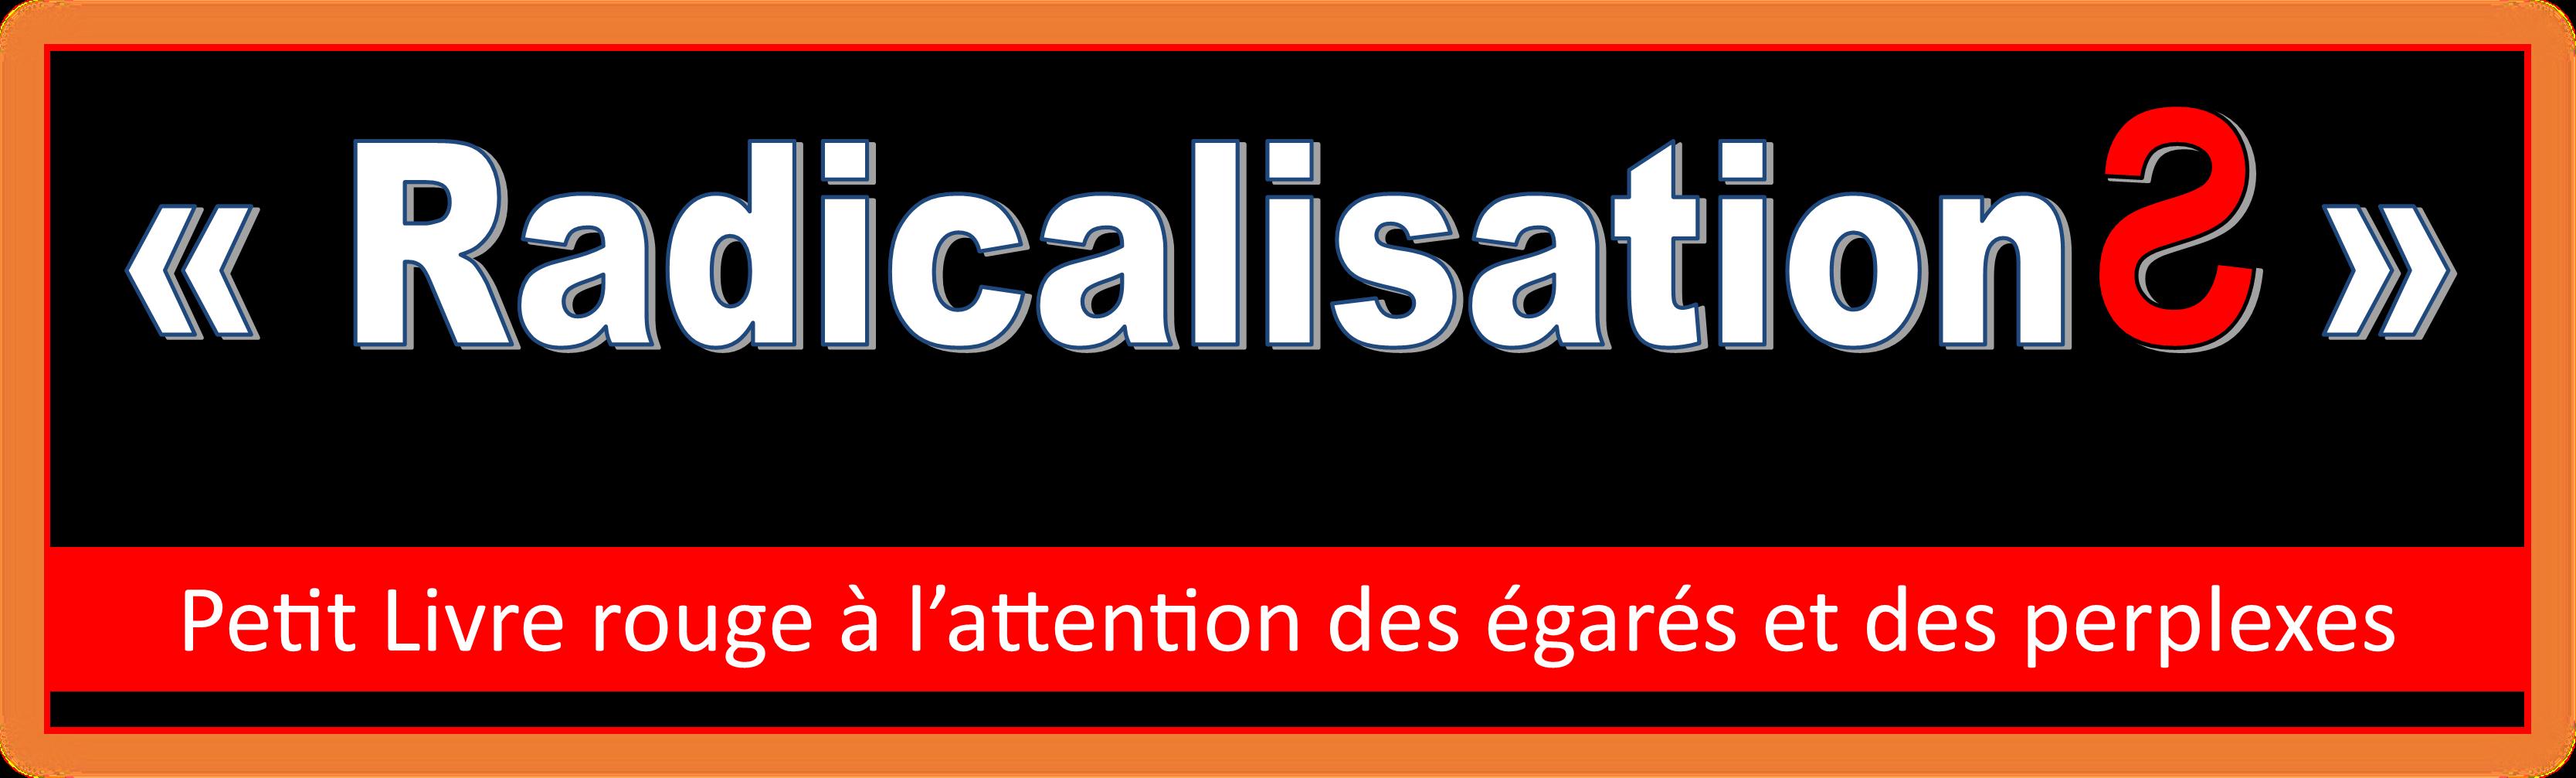 radicalisation 7hd